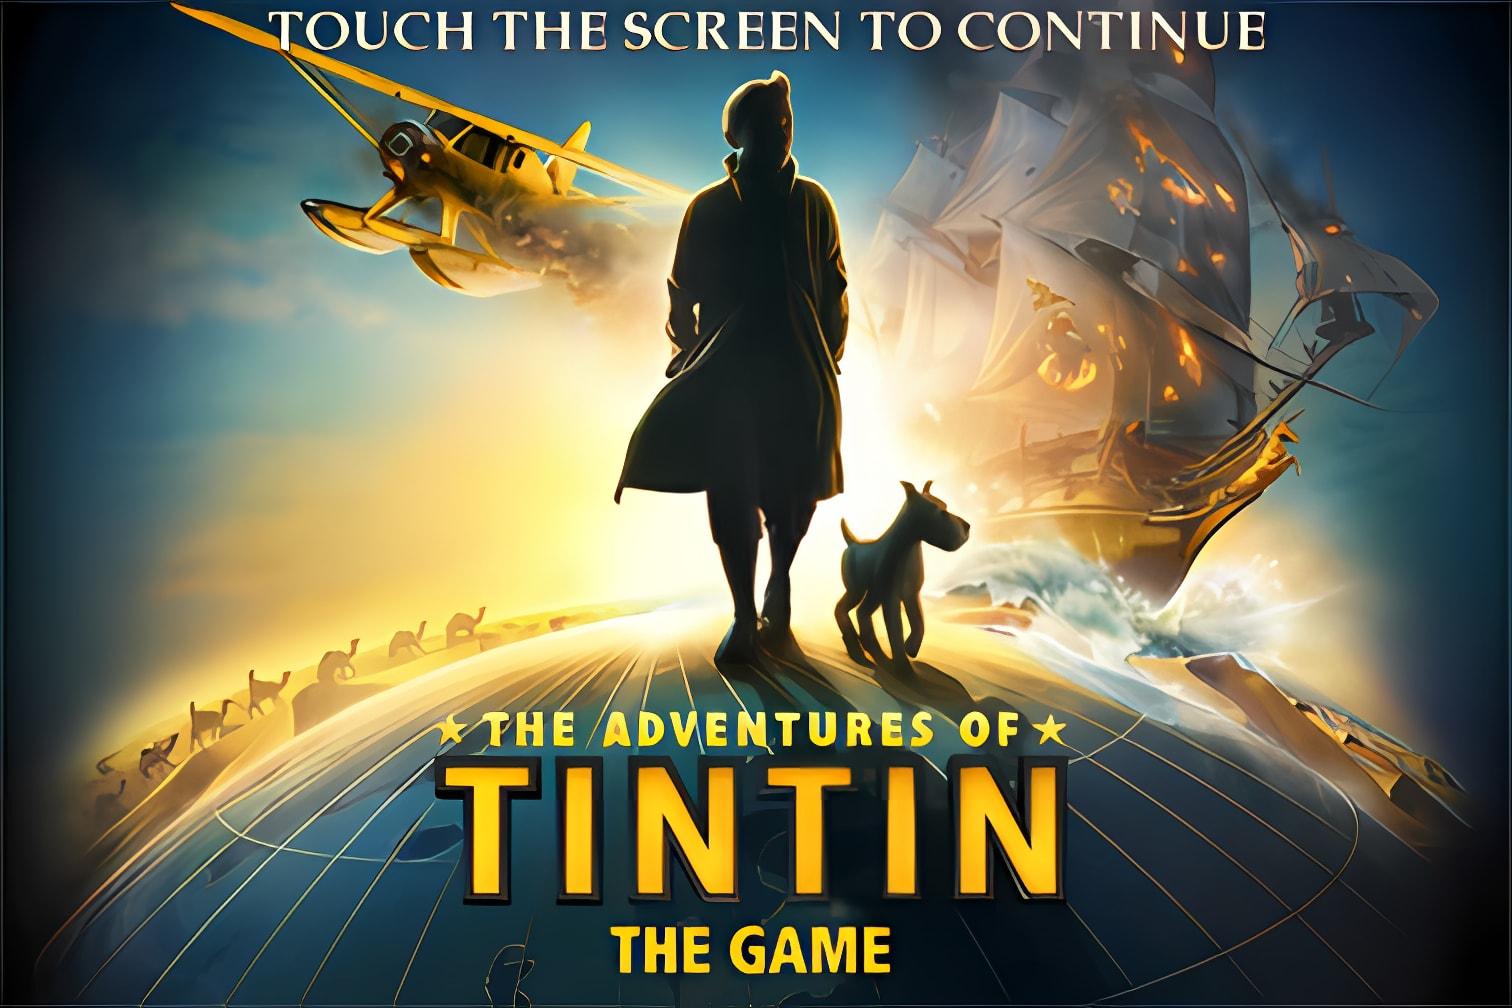 Les Aventures de Tintin HD